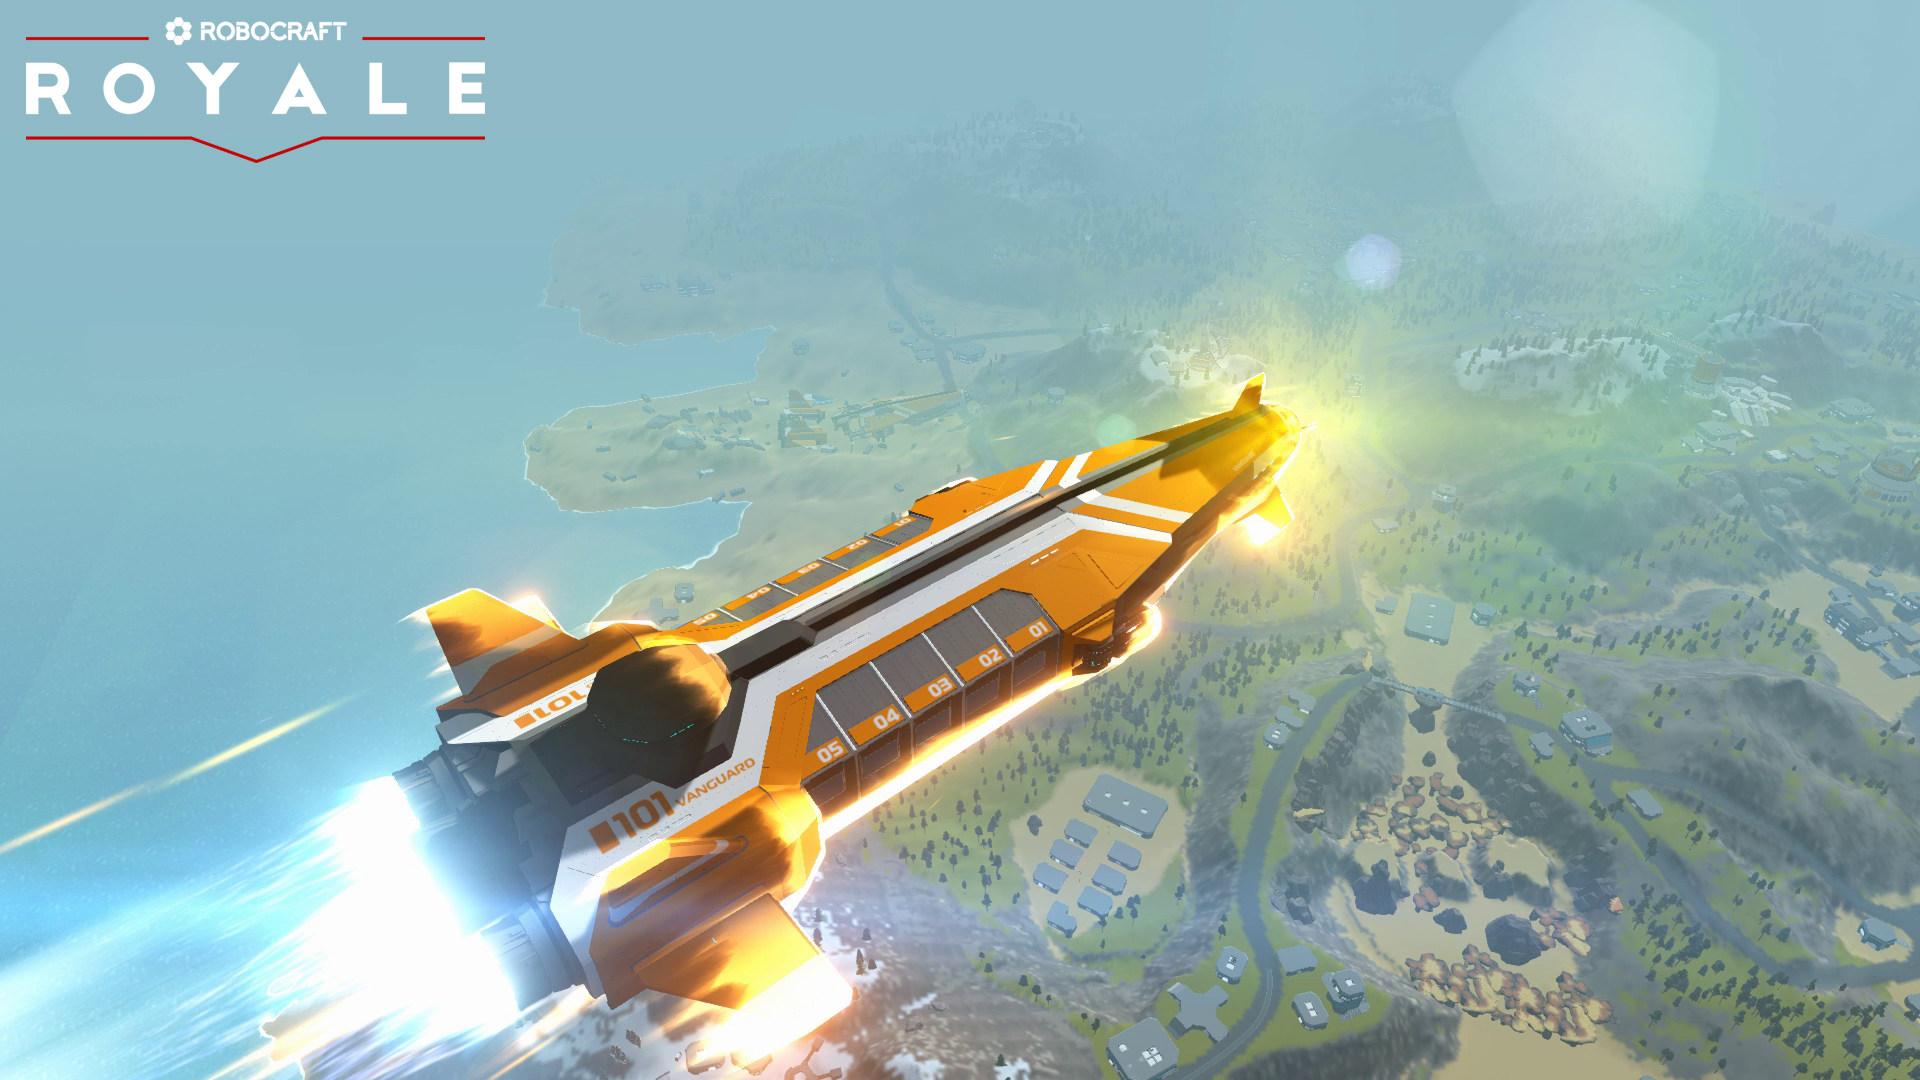 Robocraft Royale - Steam Early Access Trailer | pressakey.com